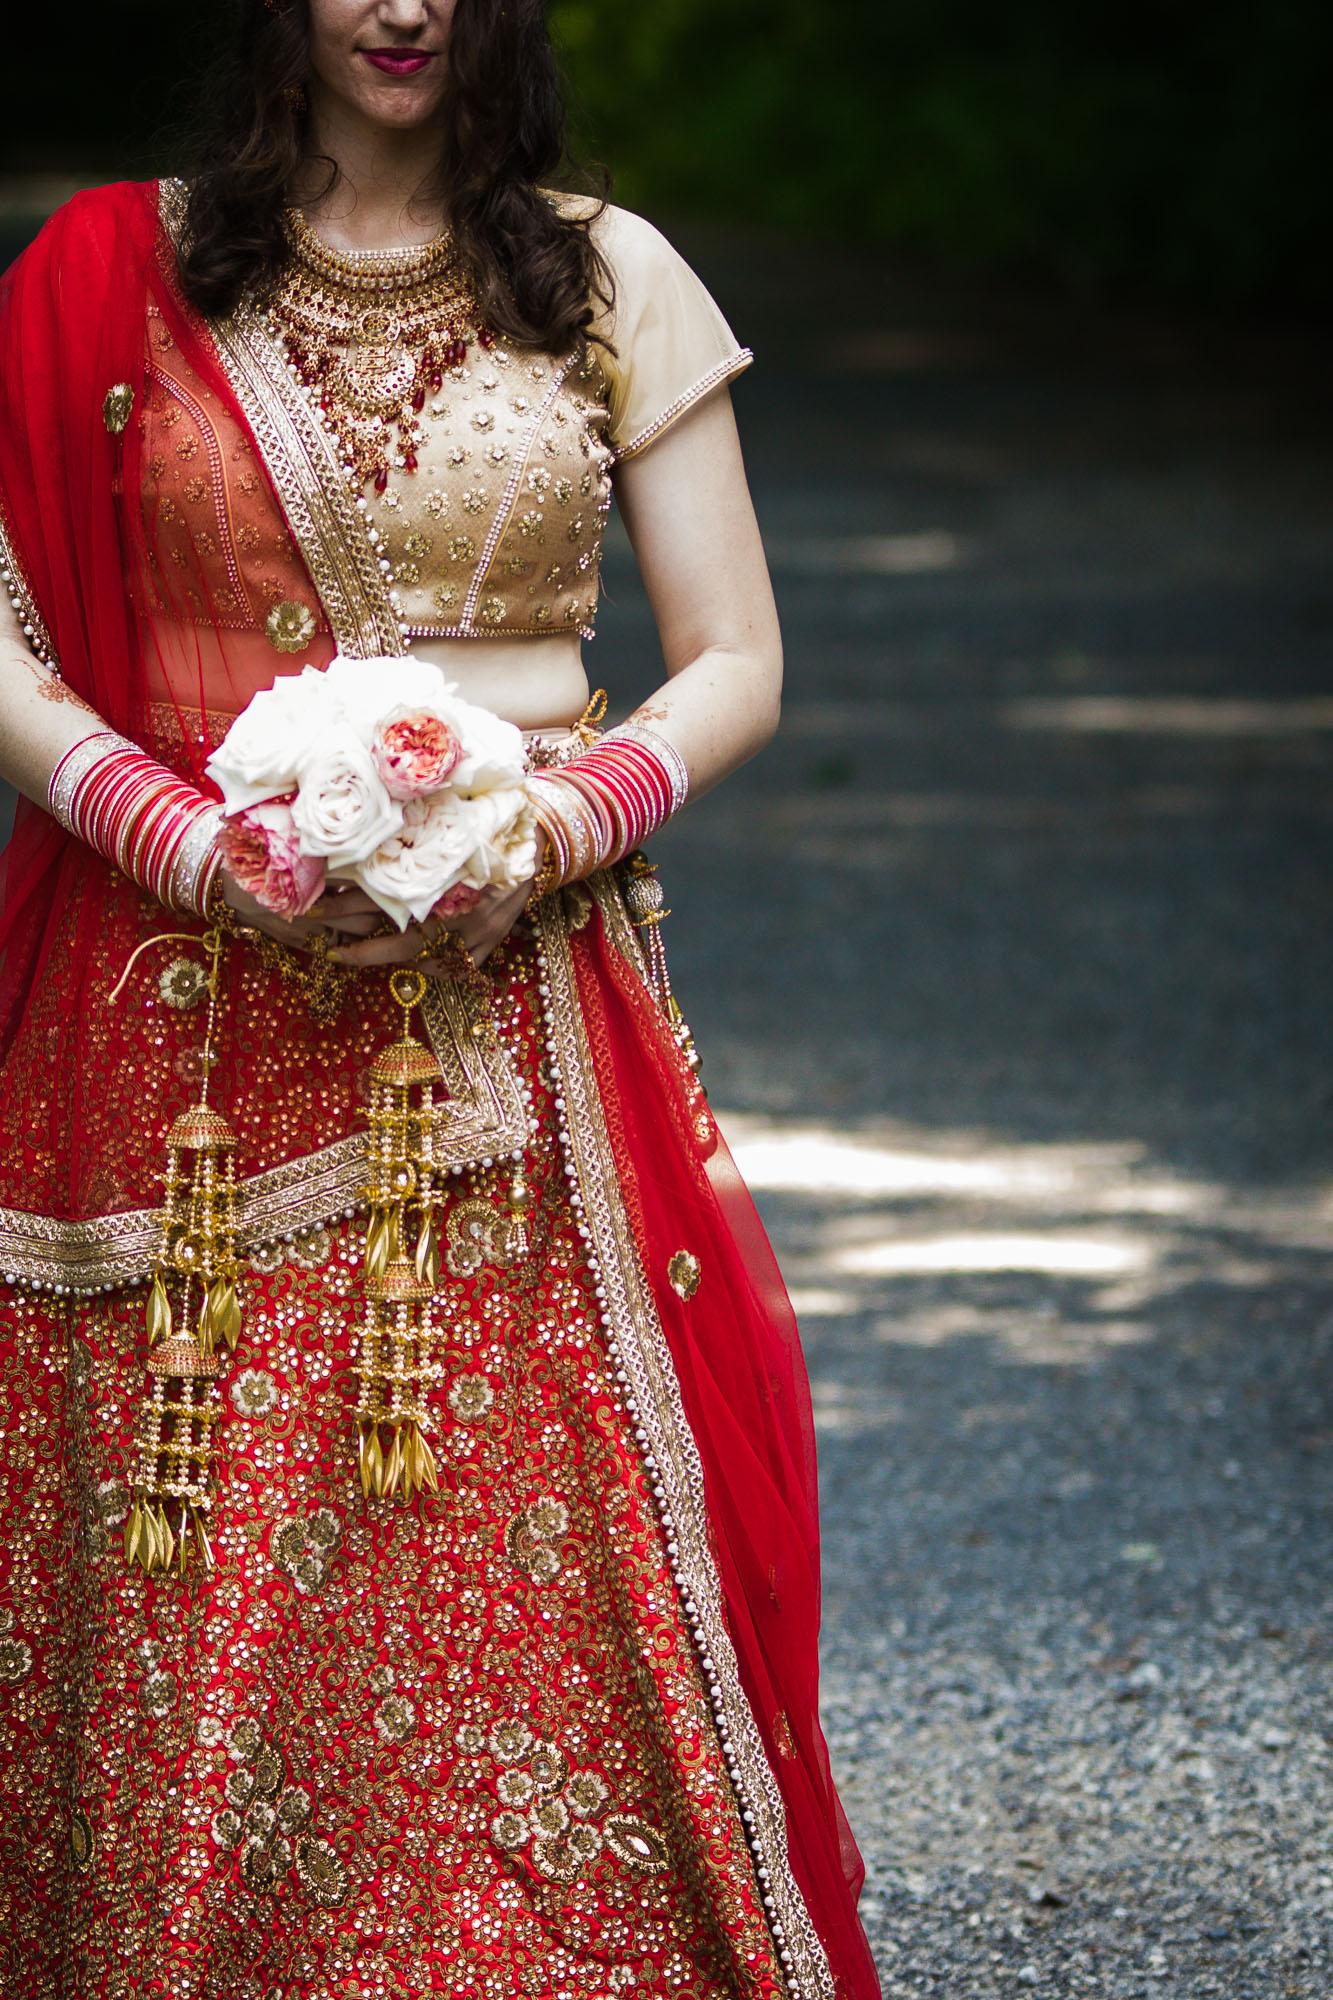 VALLEY GREEN INN WEDDING PHOTOS - 003.jpg